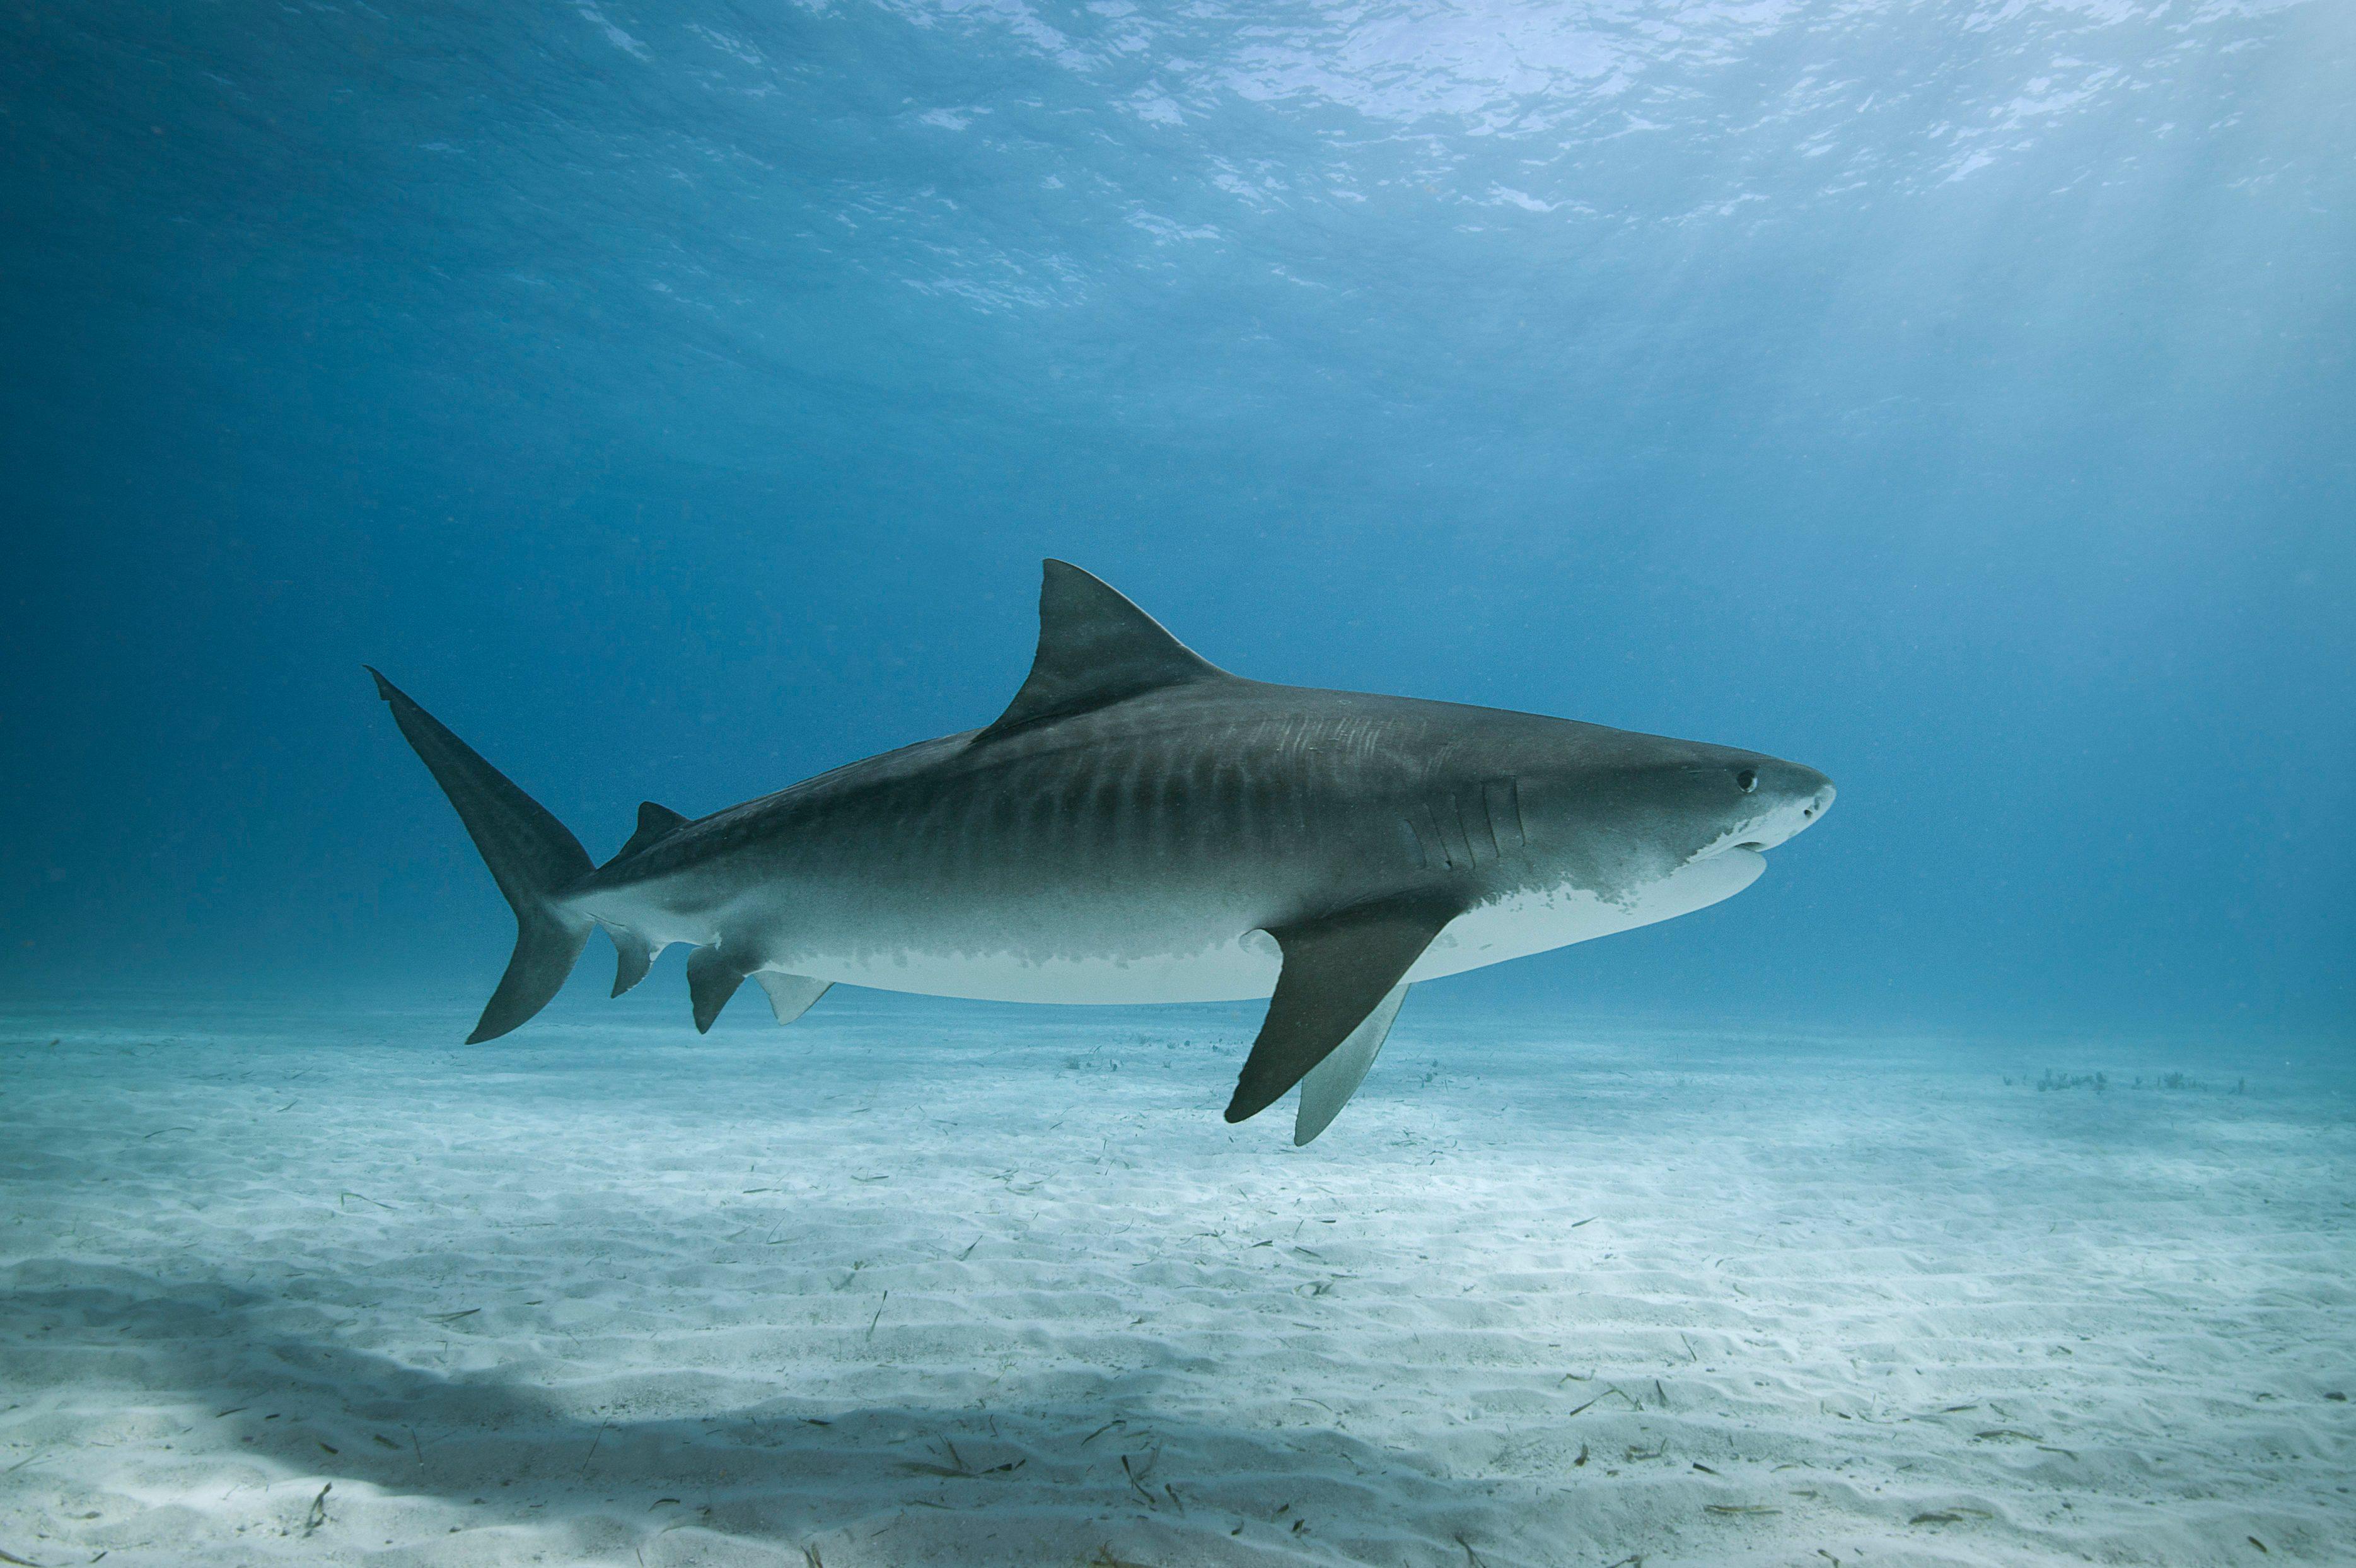 Tiger shark in water